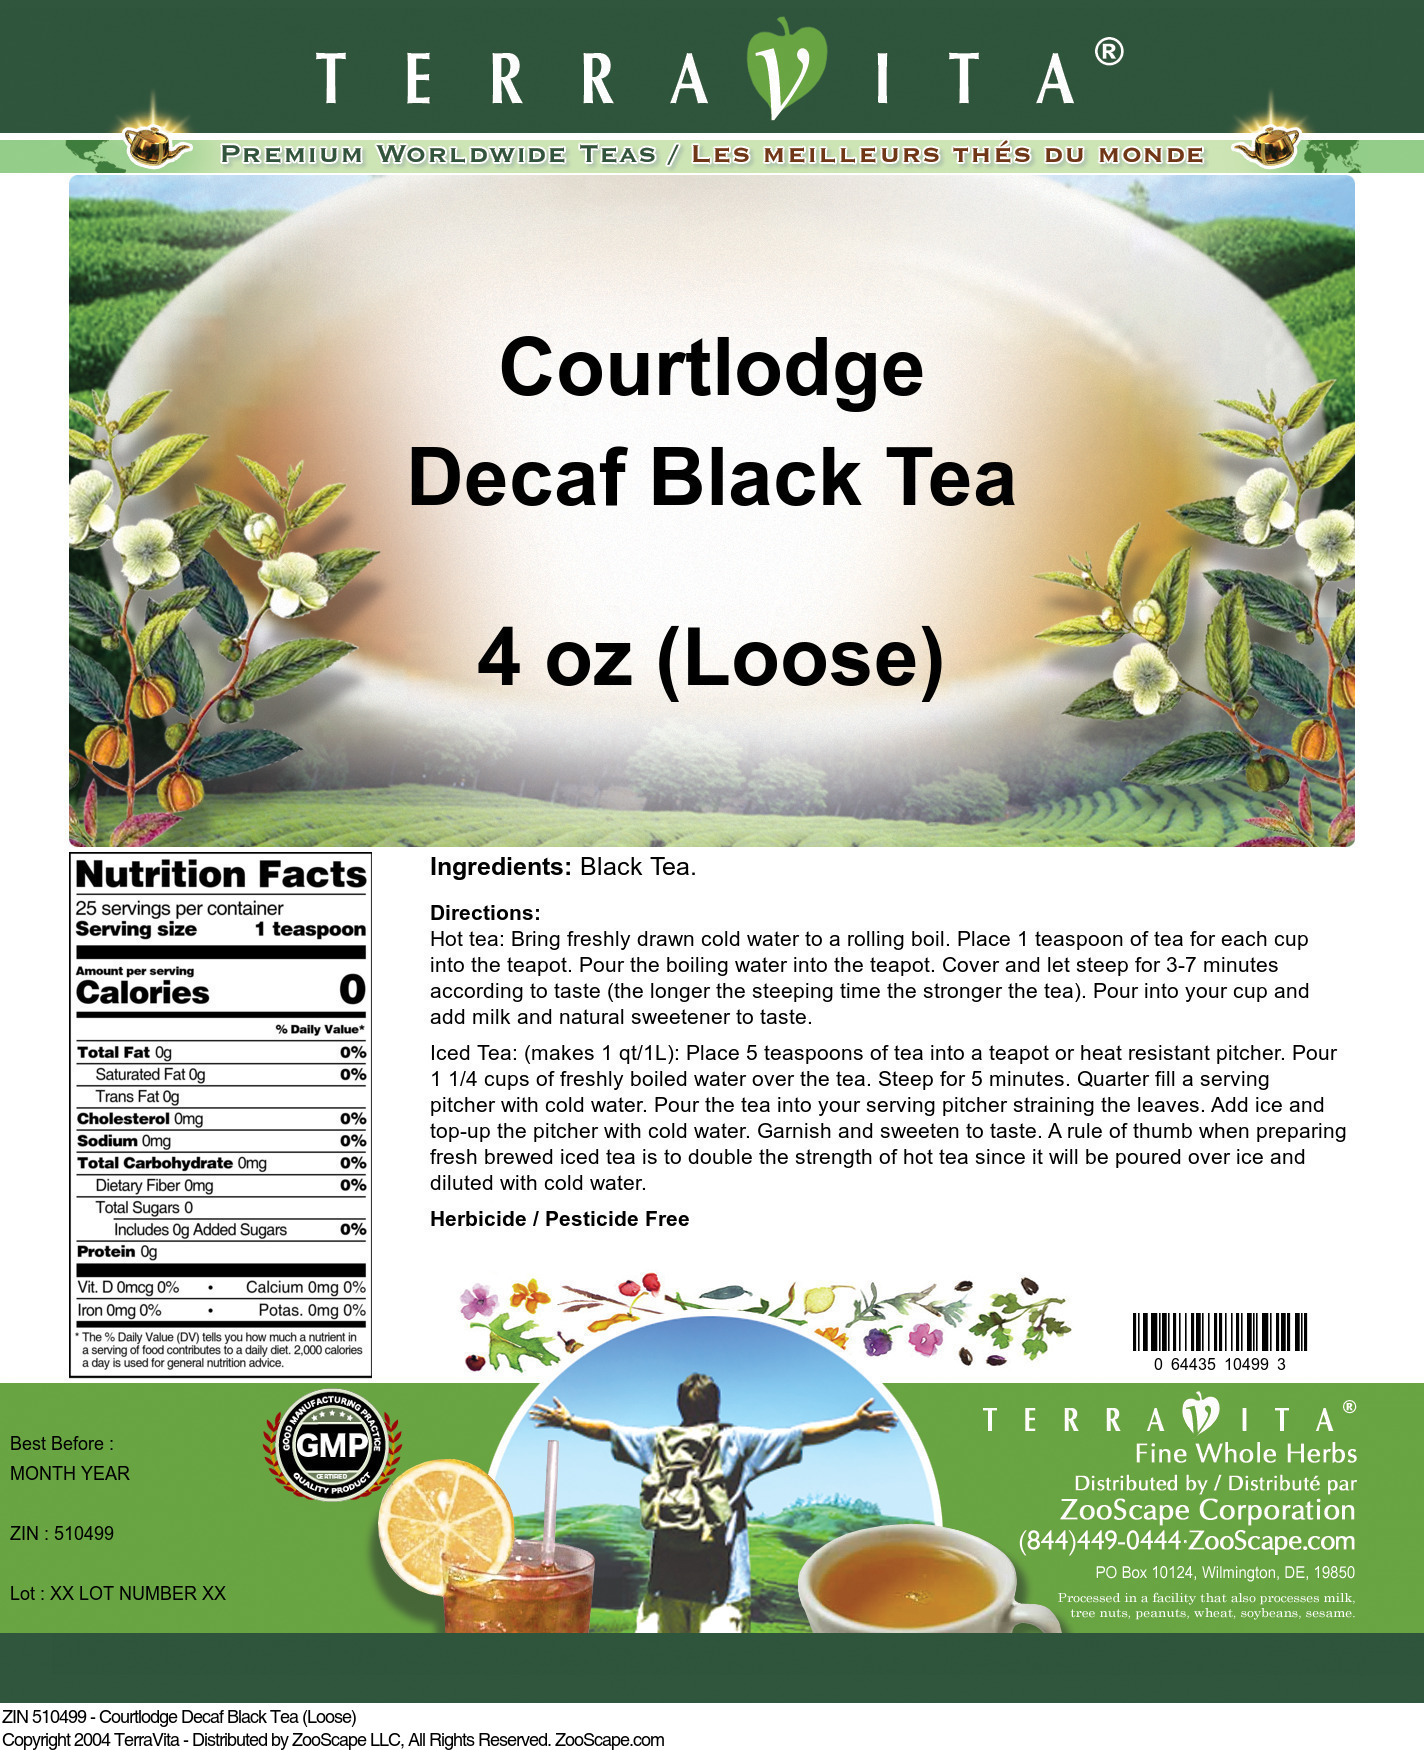 Courtlodge Decaf Black Tea